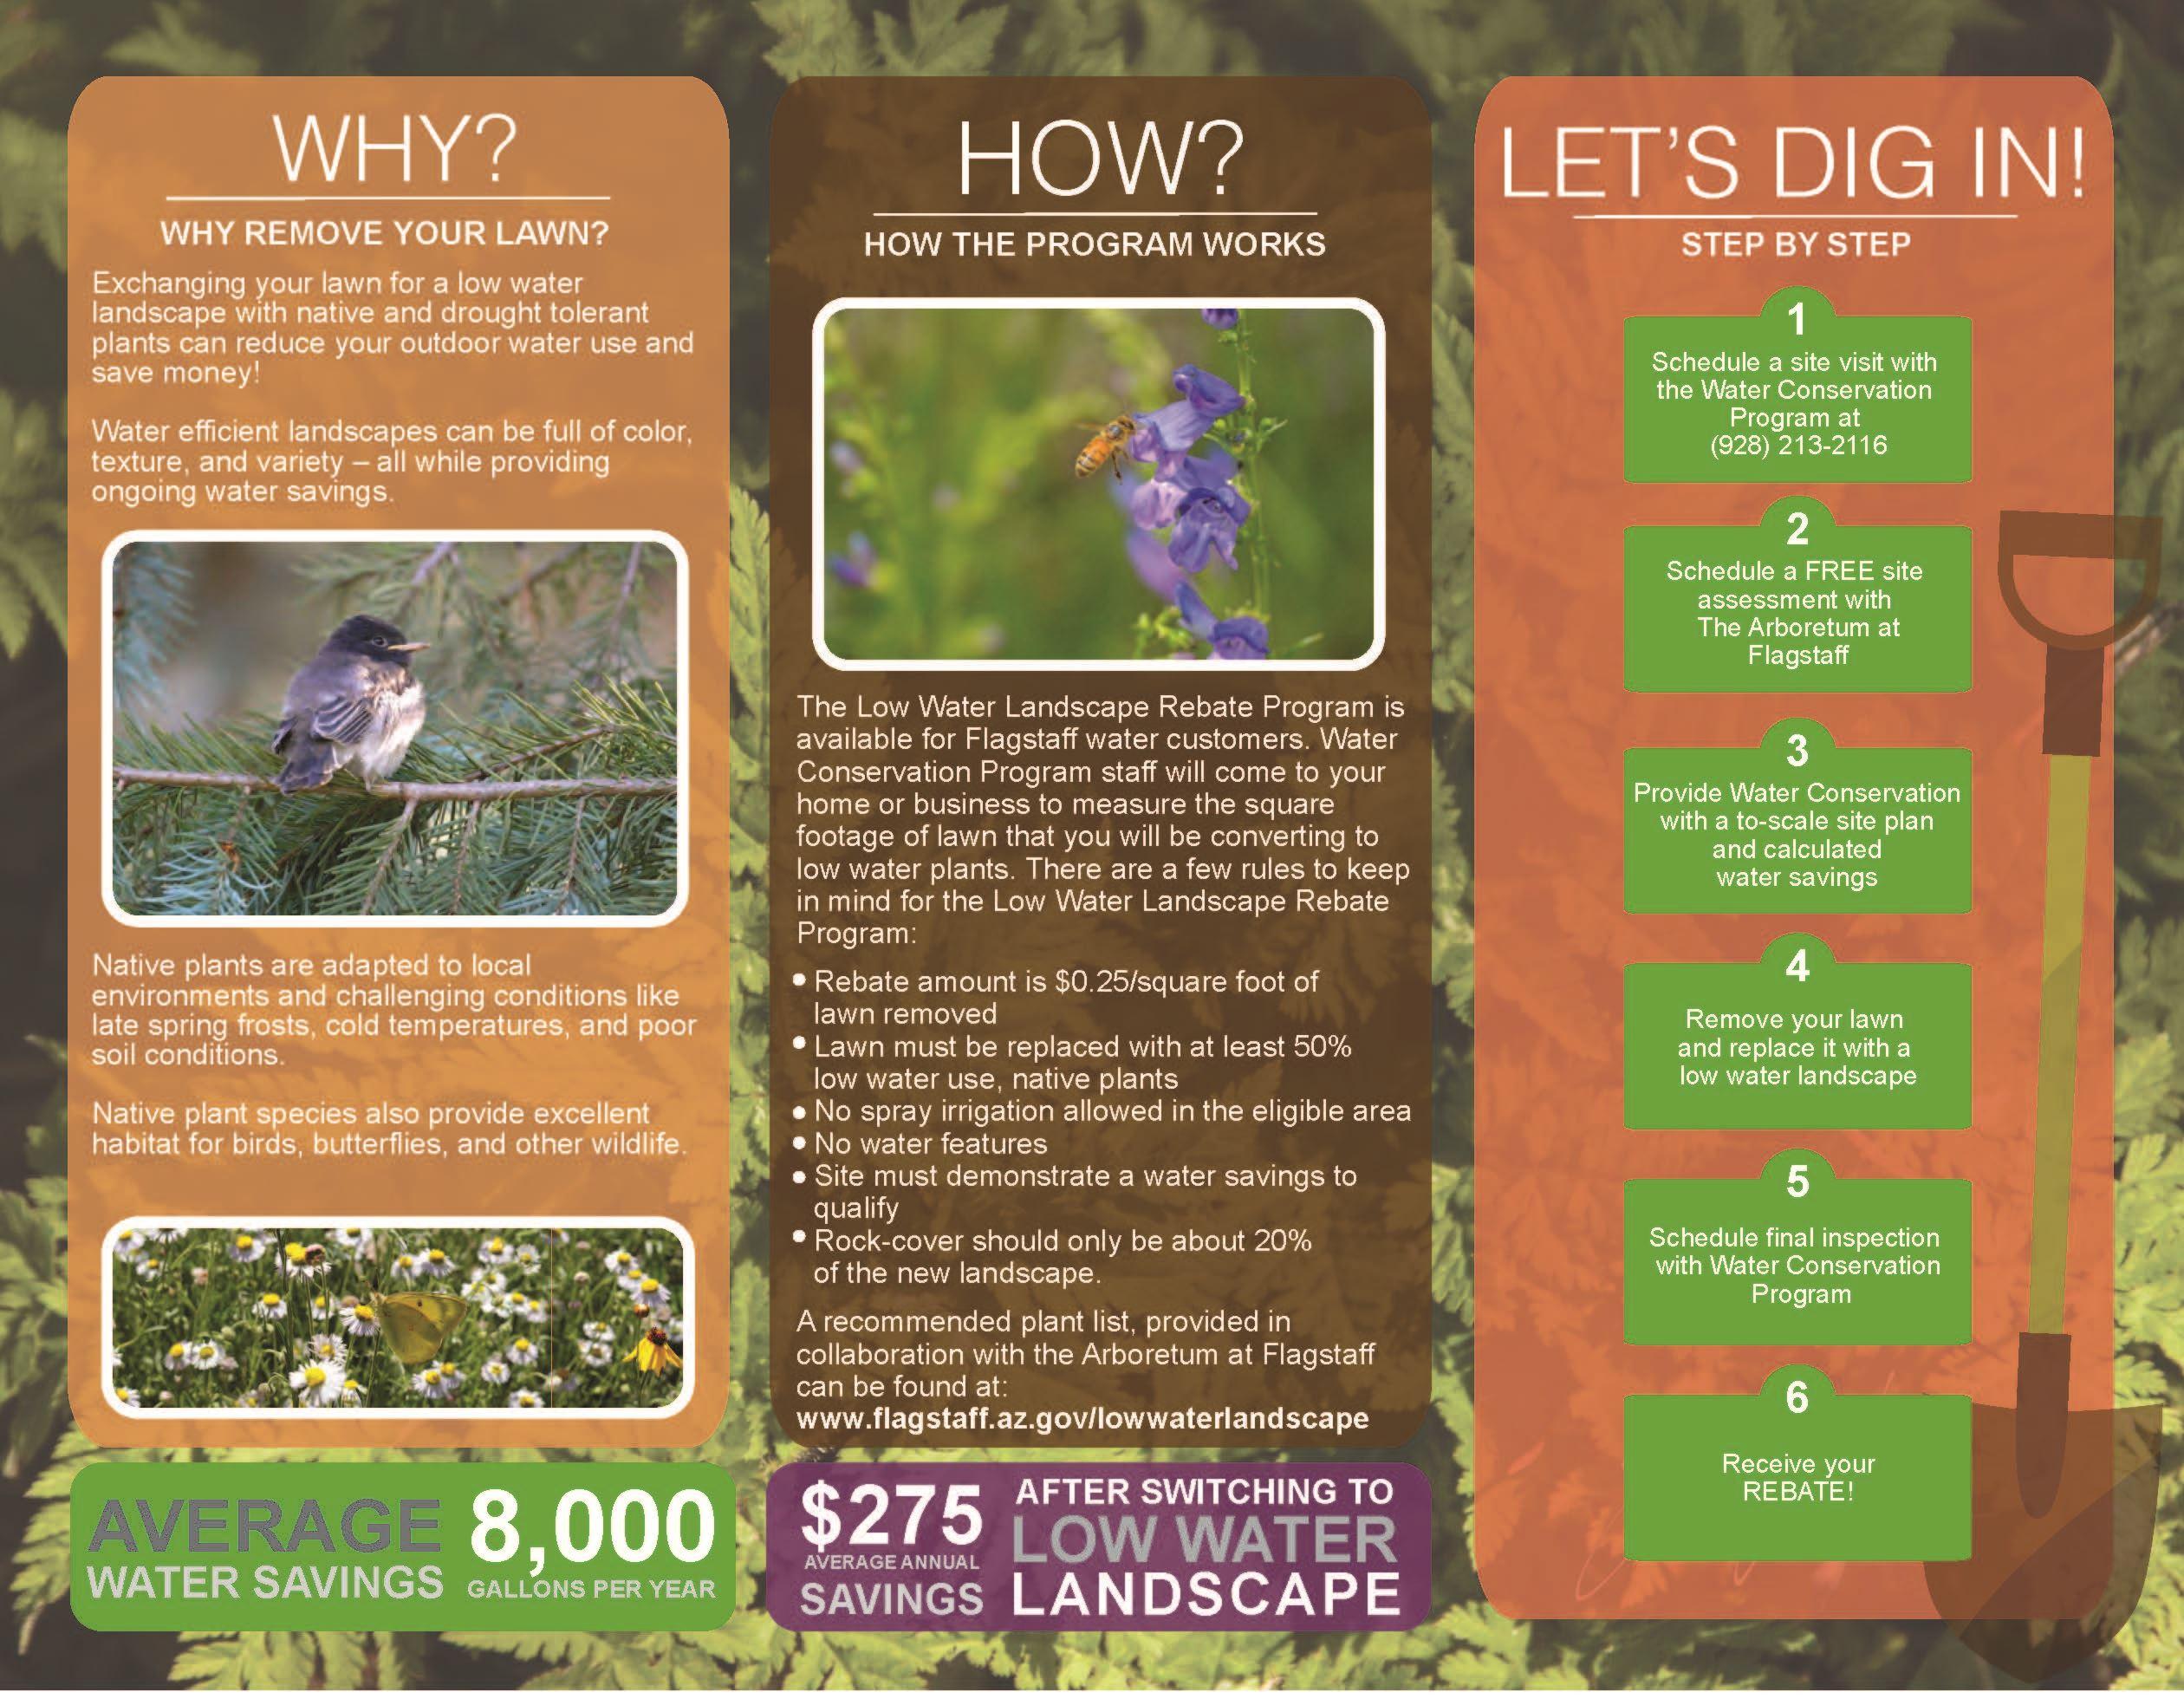 Low Water Landscape Program | City of Flagstaff Official Website